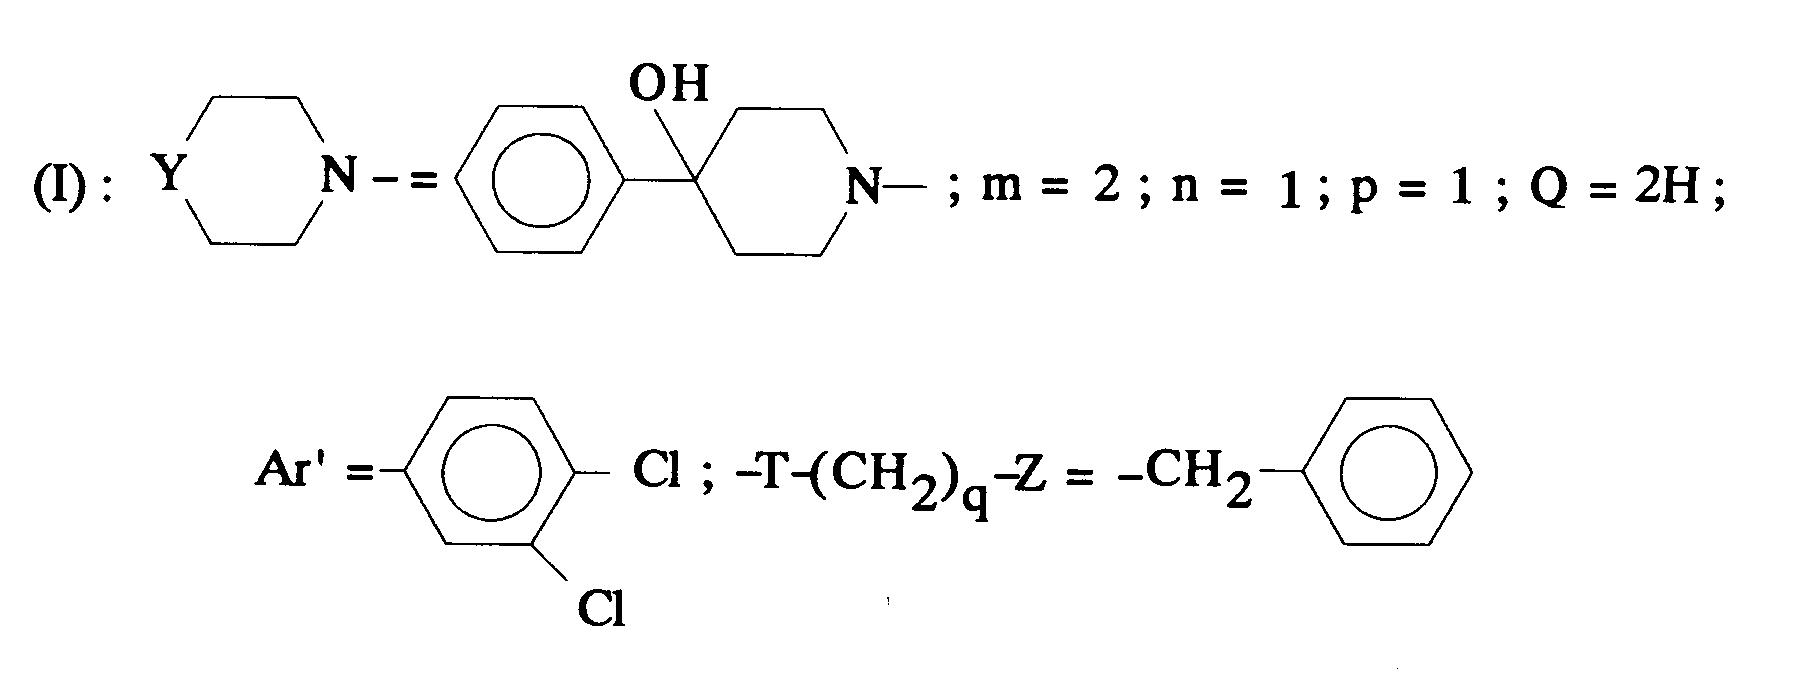 Patente EP0512901A1 - Aminated polycyclic compounds and